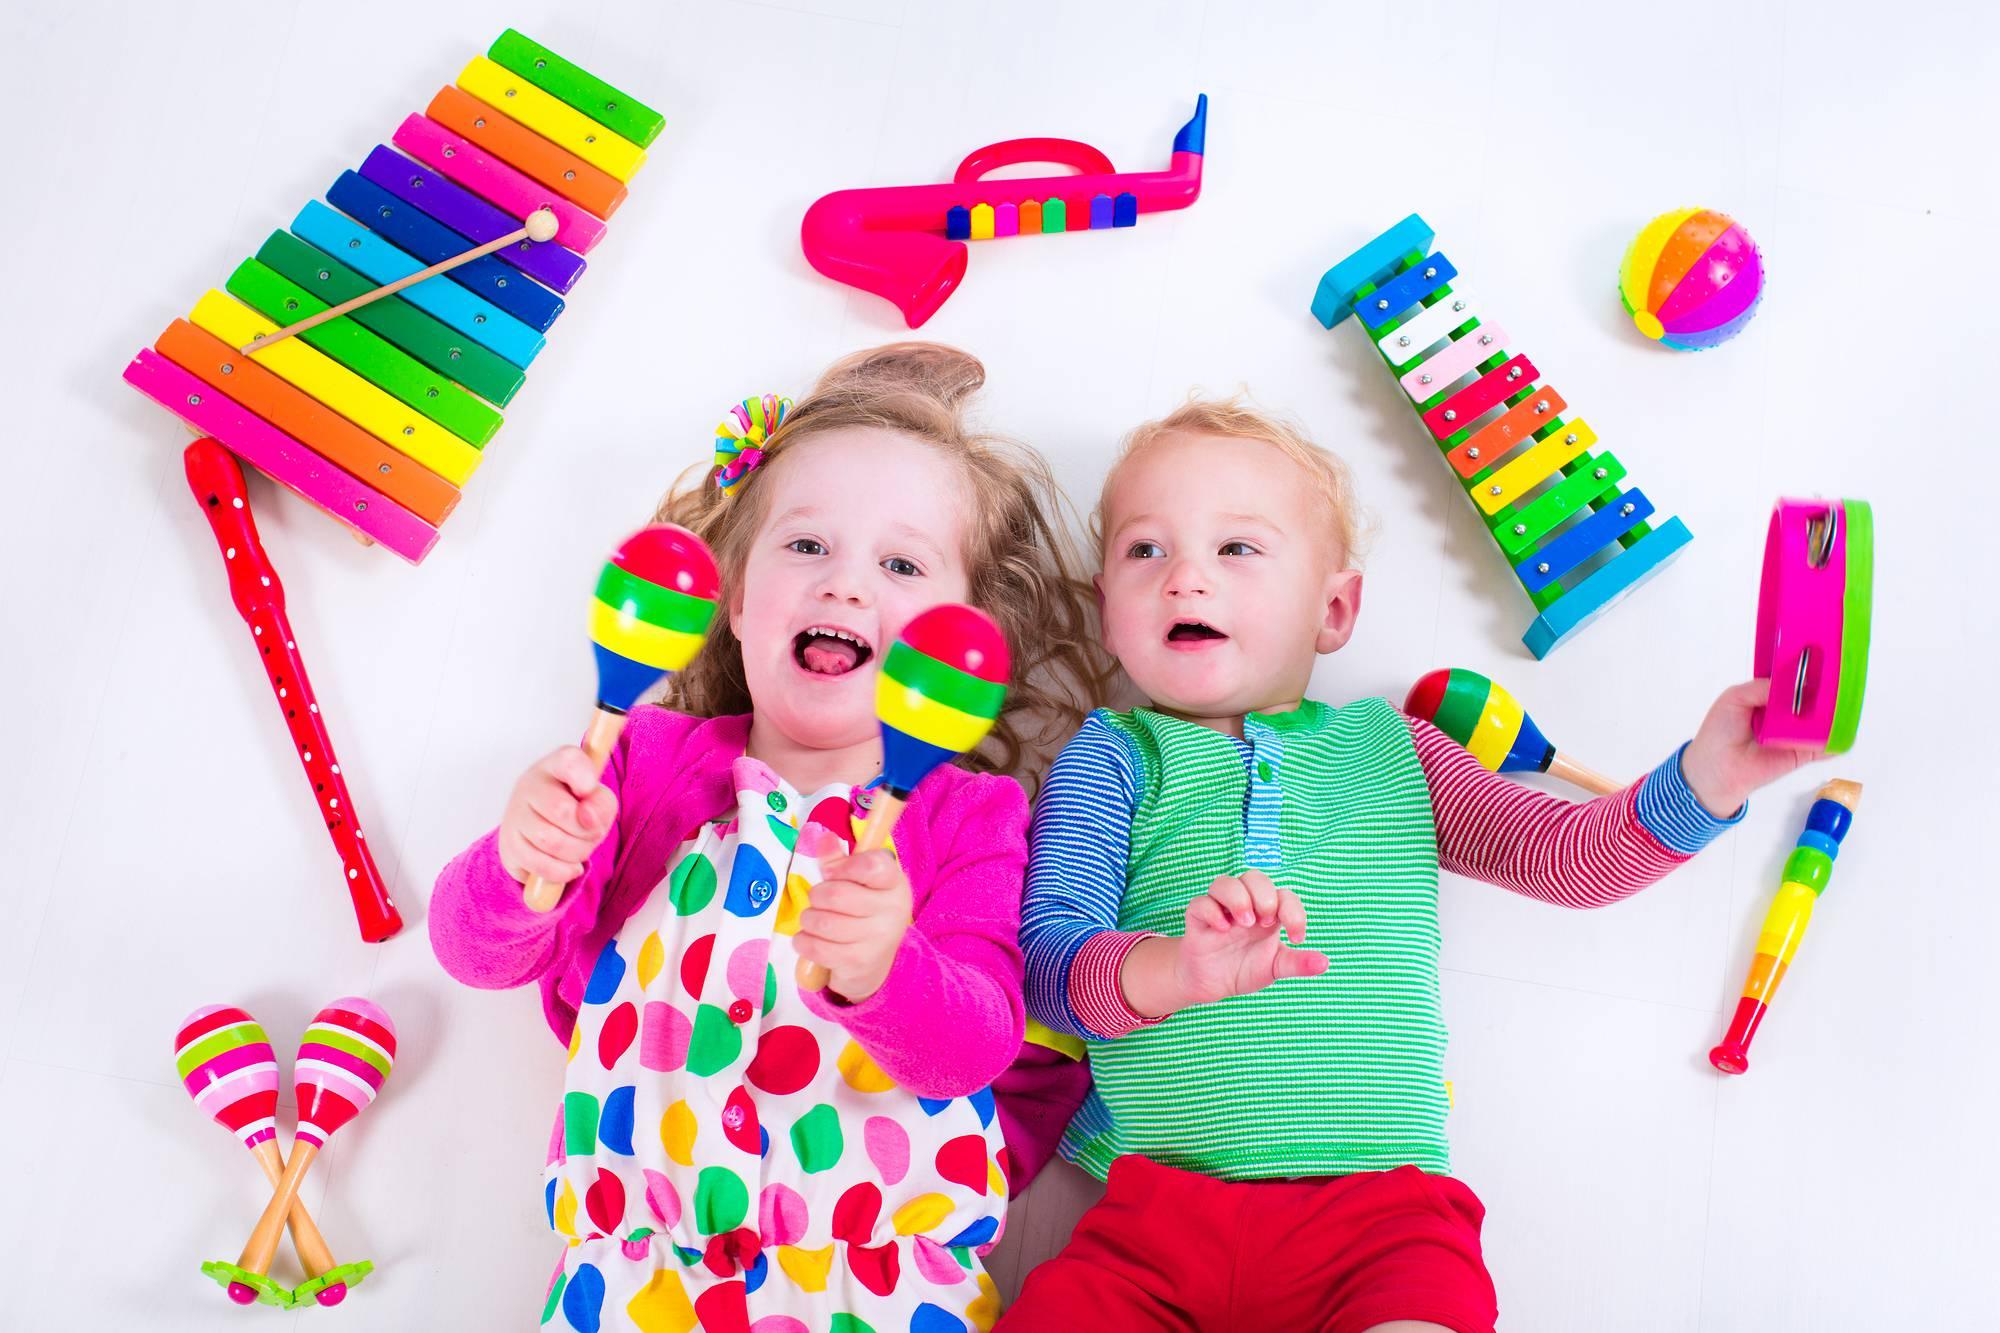 Photo of ١٩ فكرة لتنمية ذكاء الاطفال وتنشيط عقولهم